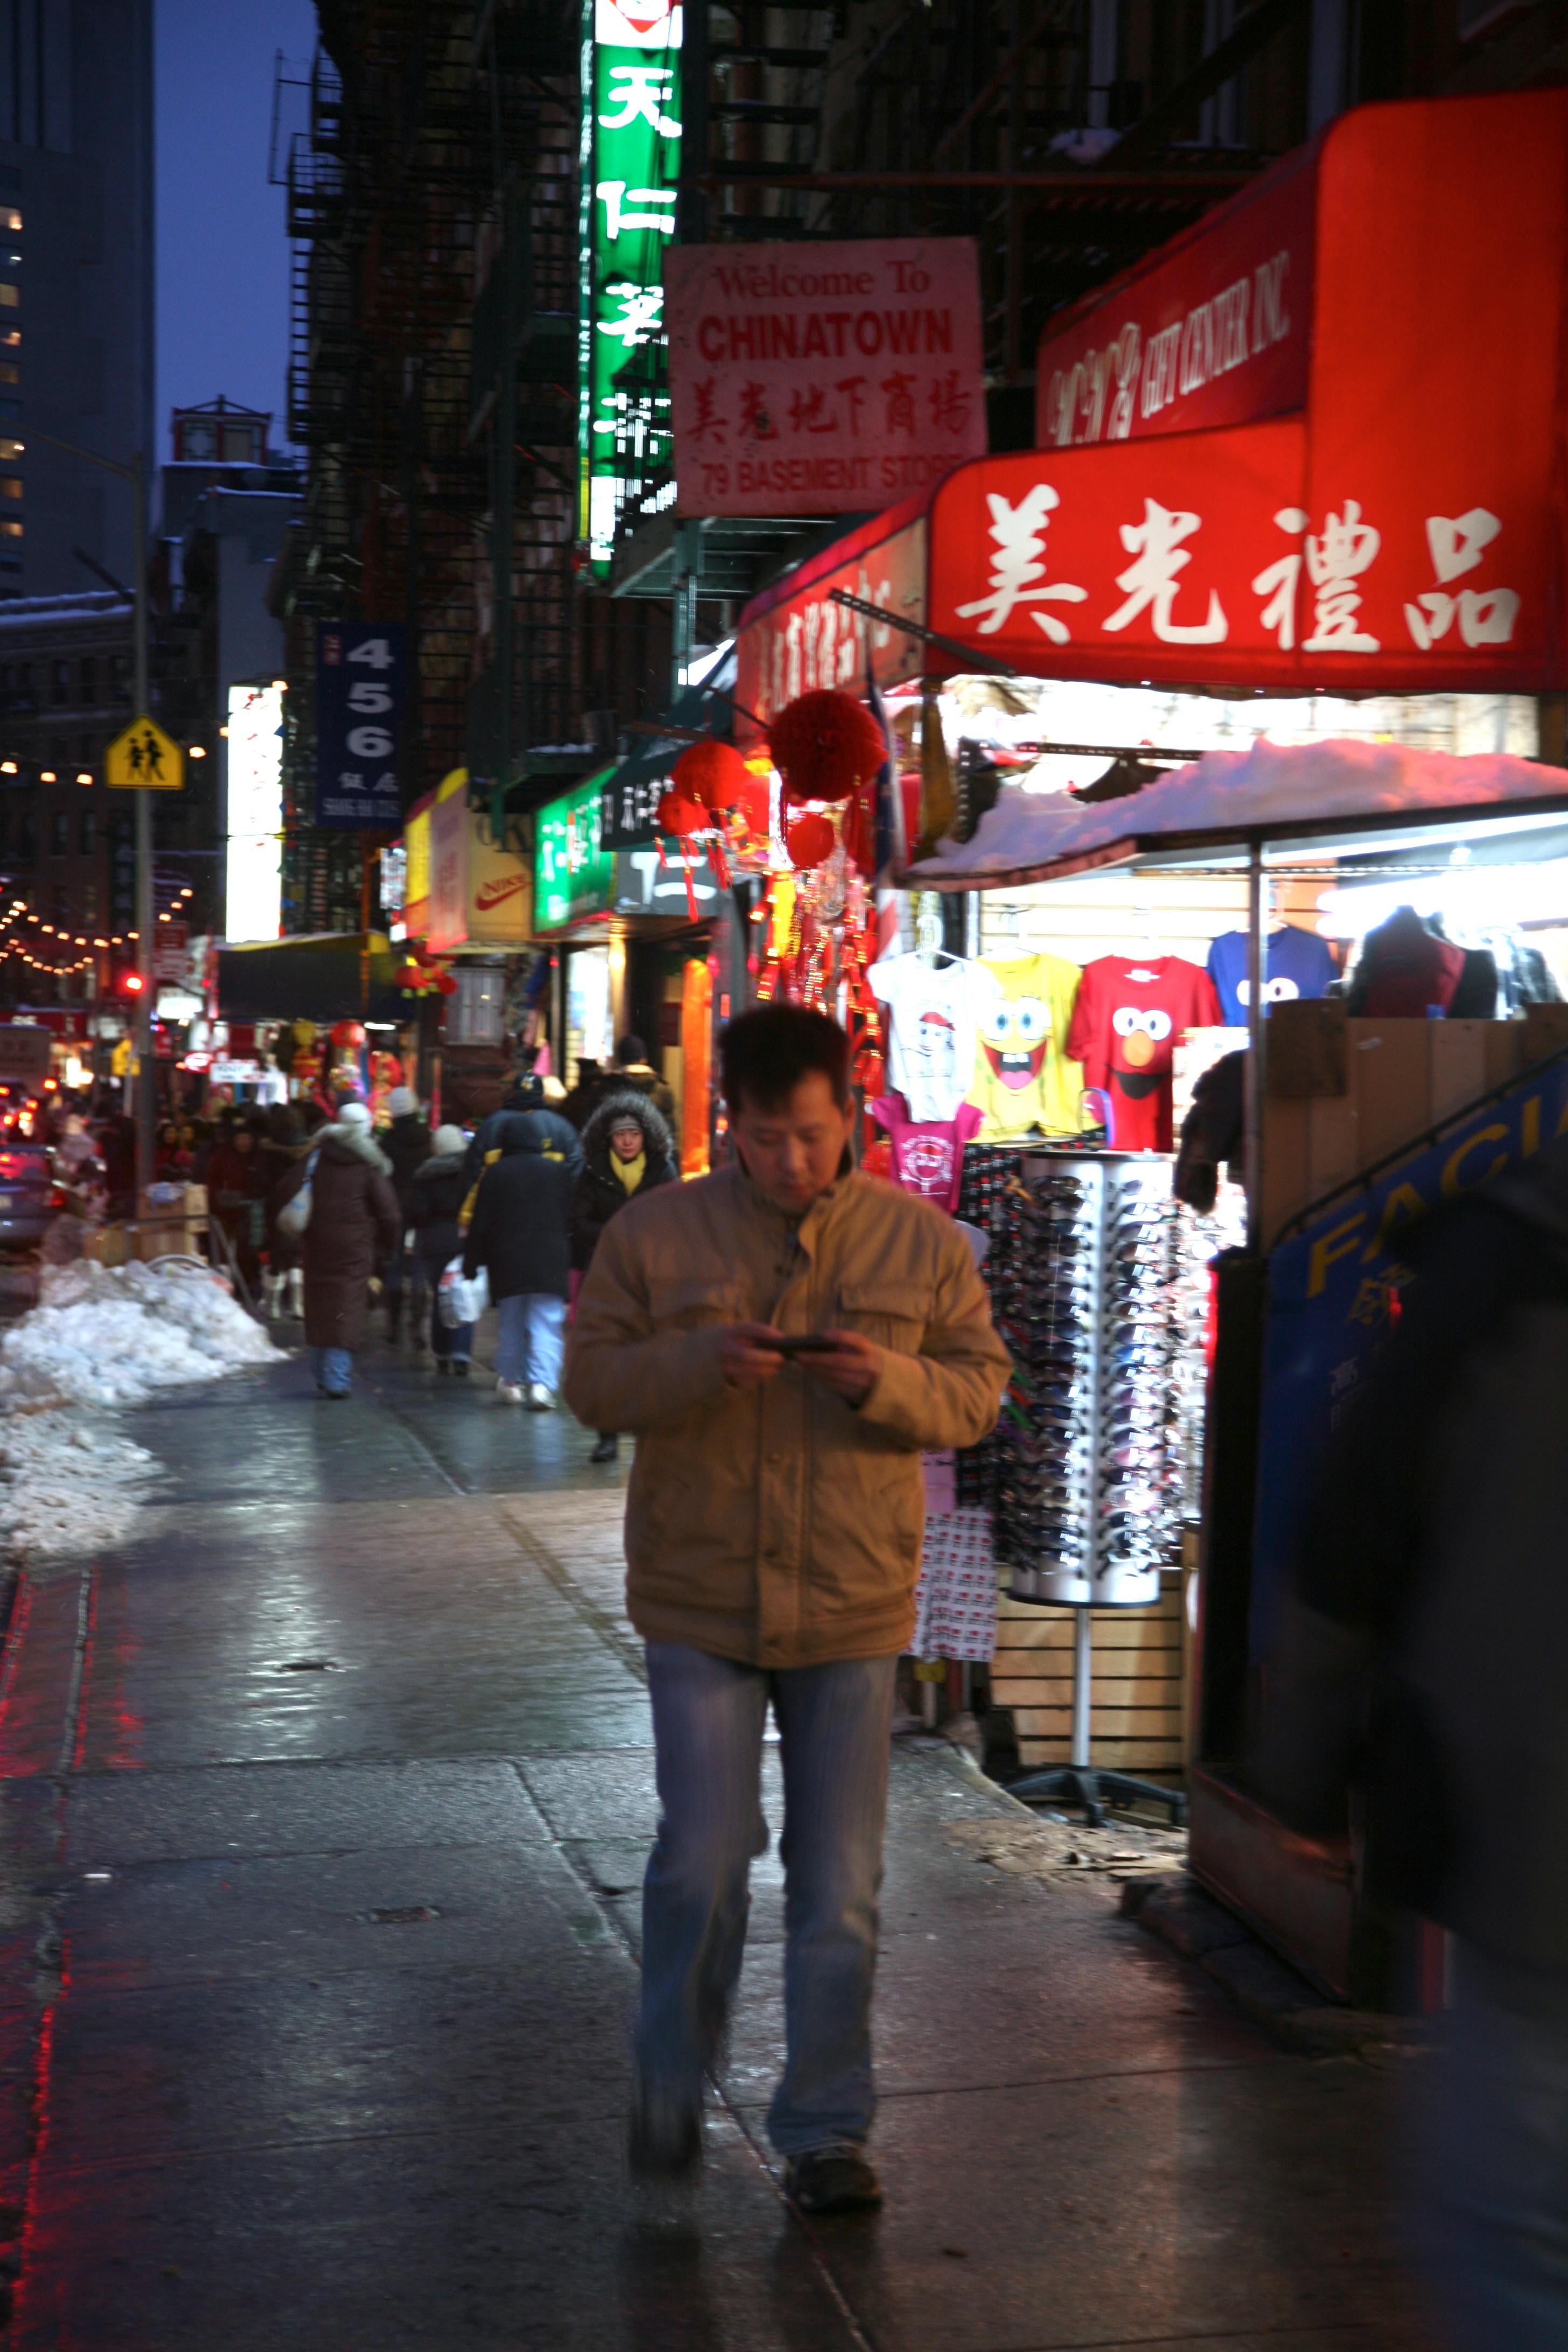 Free Images Pedestrian Road Street Night City Manhattan Crowd Downtown Travel Evening Nyc Newyork Infrastructure Newyorkcity Snapshot Ny Chinatown 2912x4368 329888 Free Stock Photos Pxhere